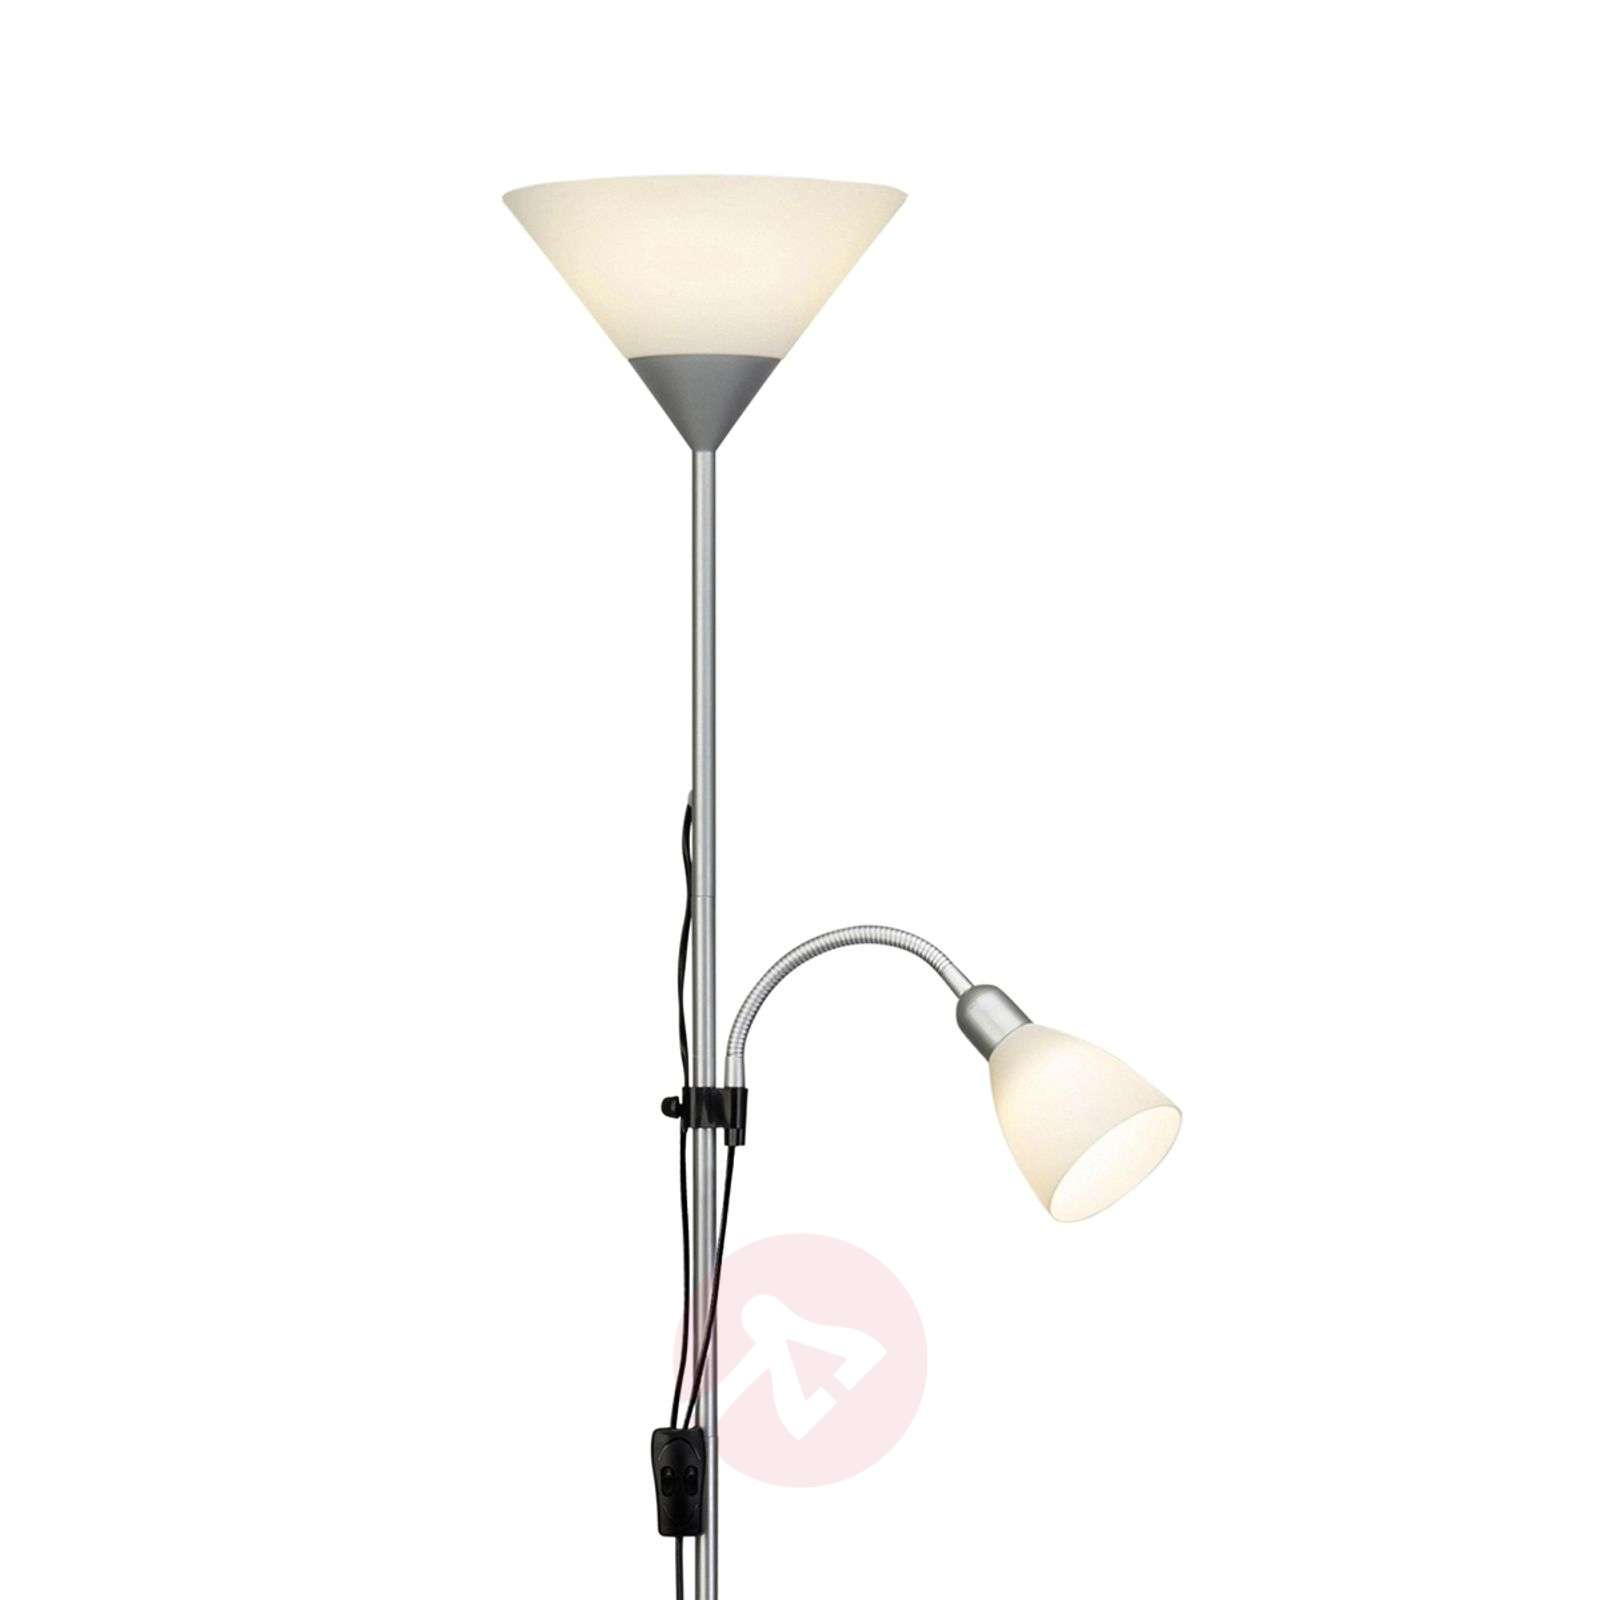 Spari LED floor lamp with reading lamp-1509192-01